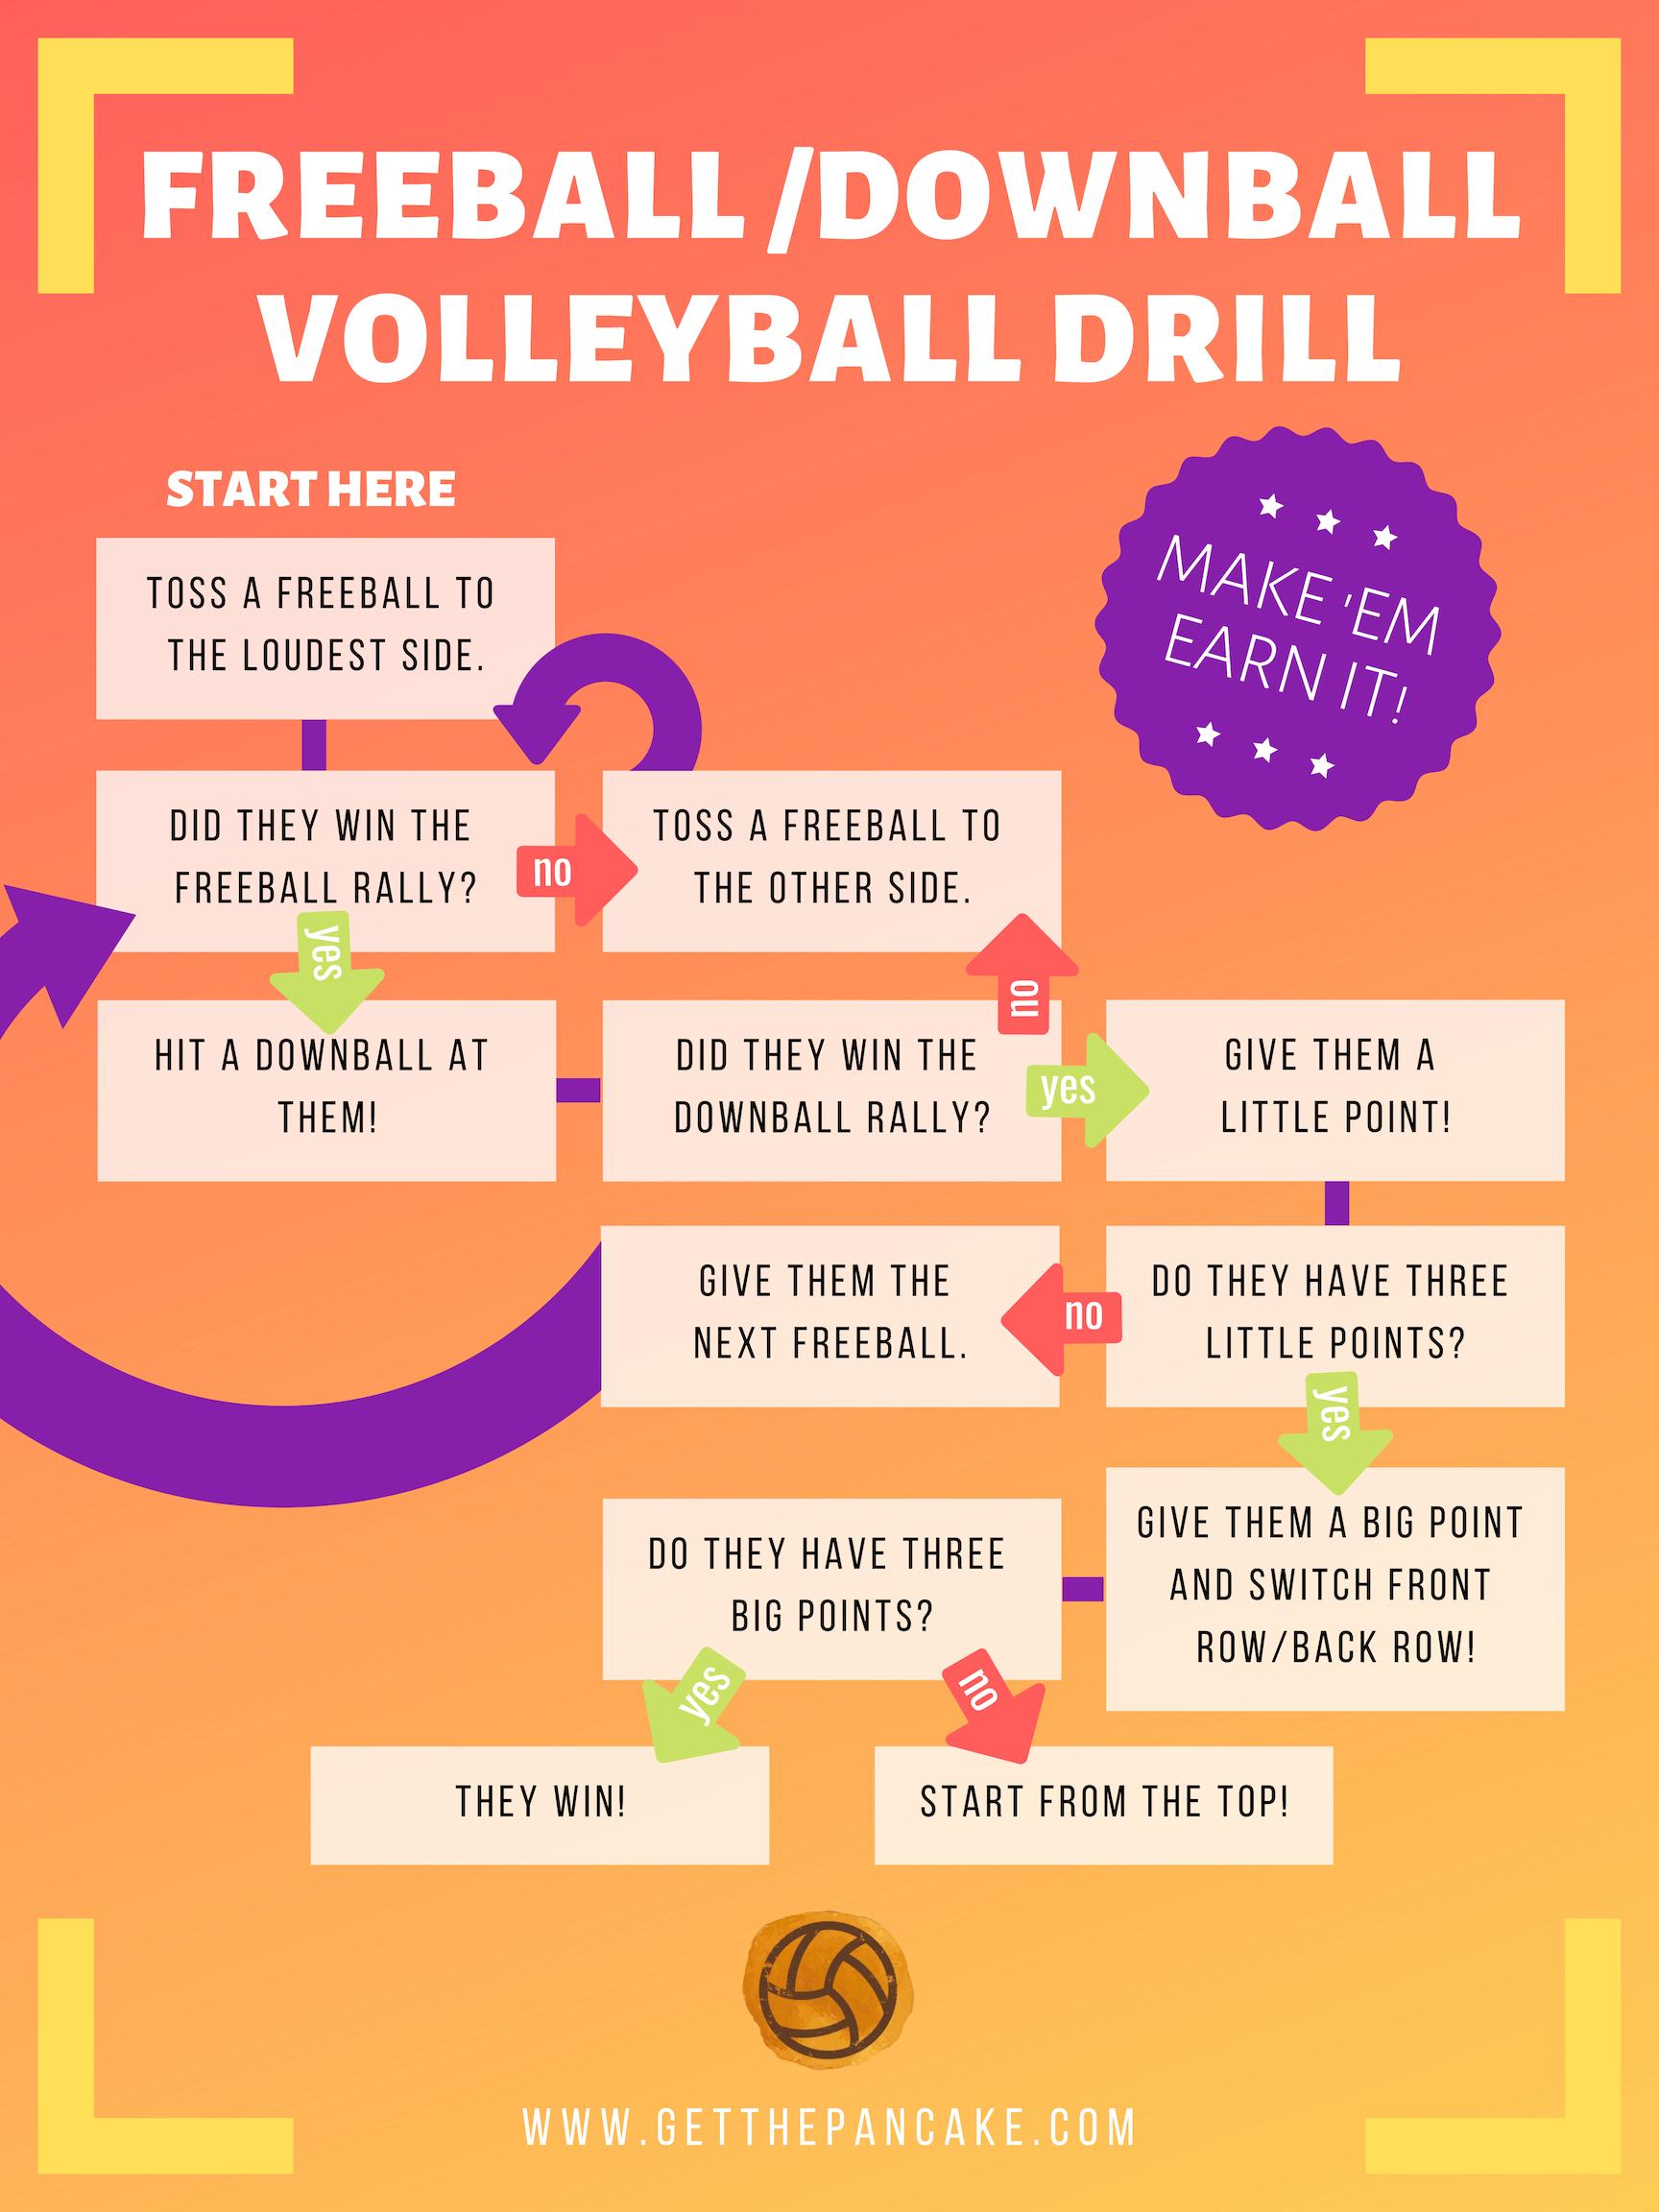 Freeball-Downball Volleyball Drill.png